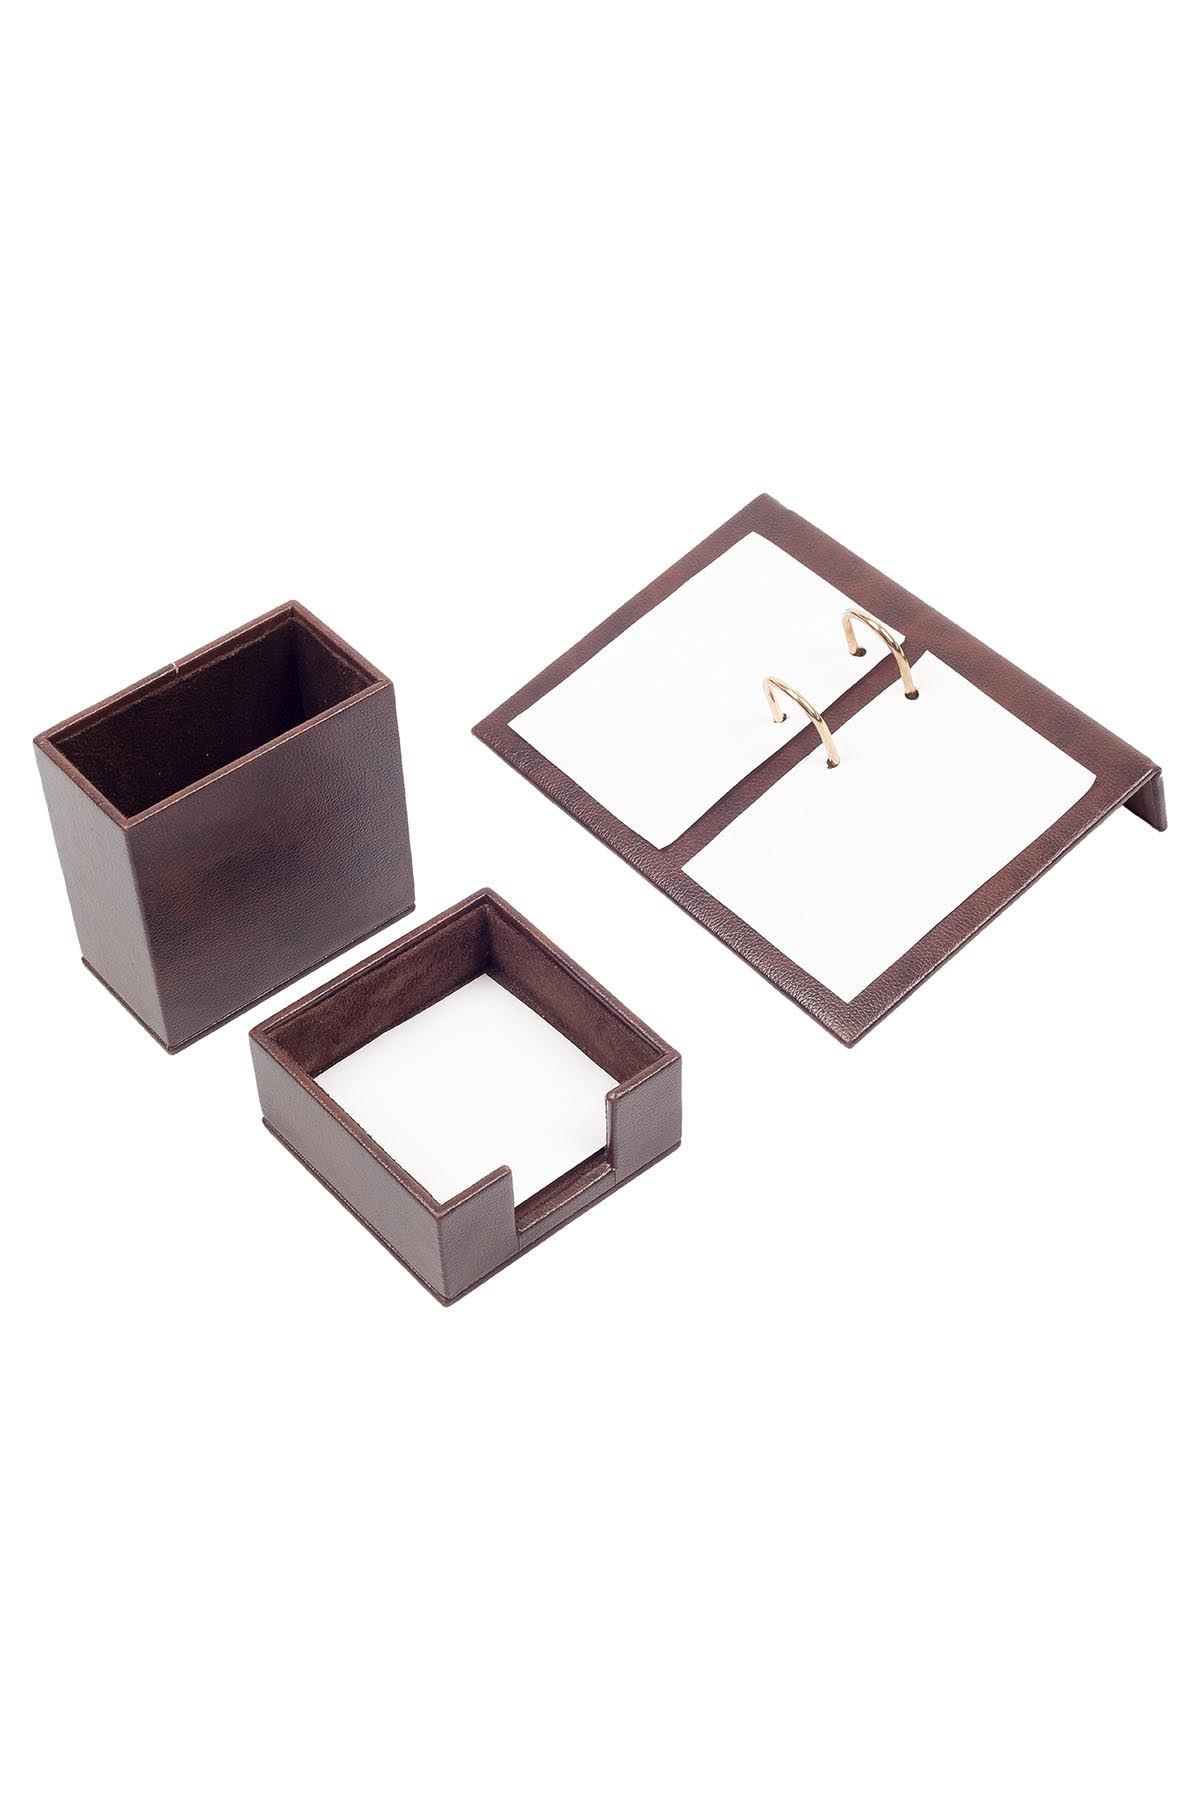 Leather Desk Accessories set of 3 Brown  Desk Set Accessories   Desktop Accessories   Desk Accessories   Desk Organizers